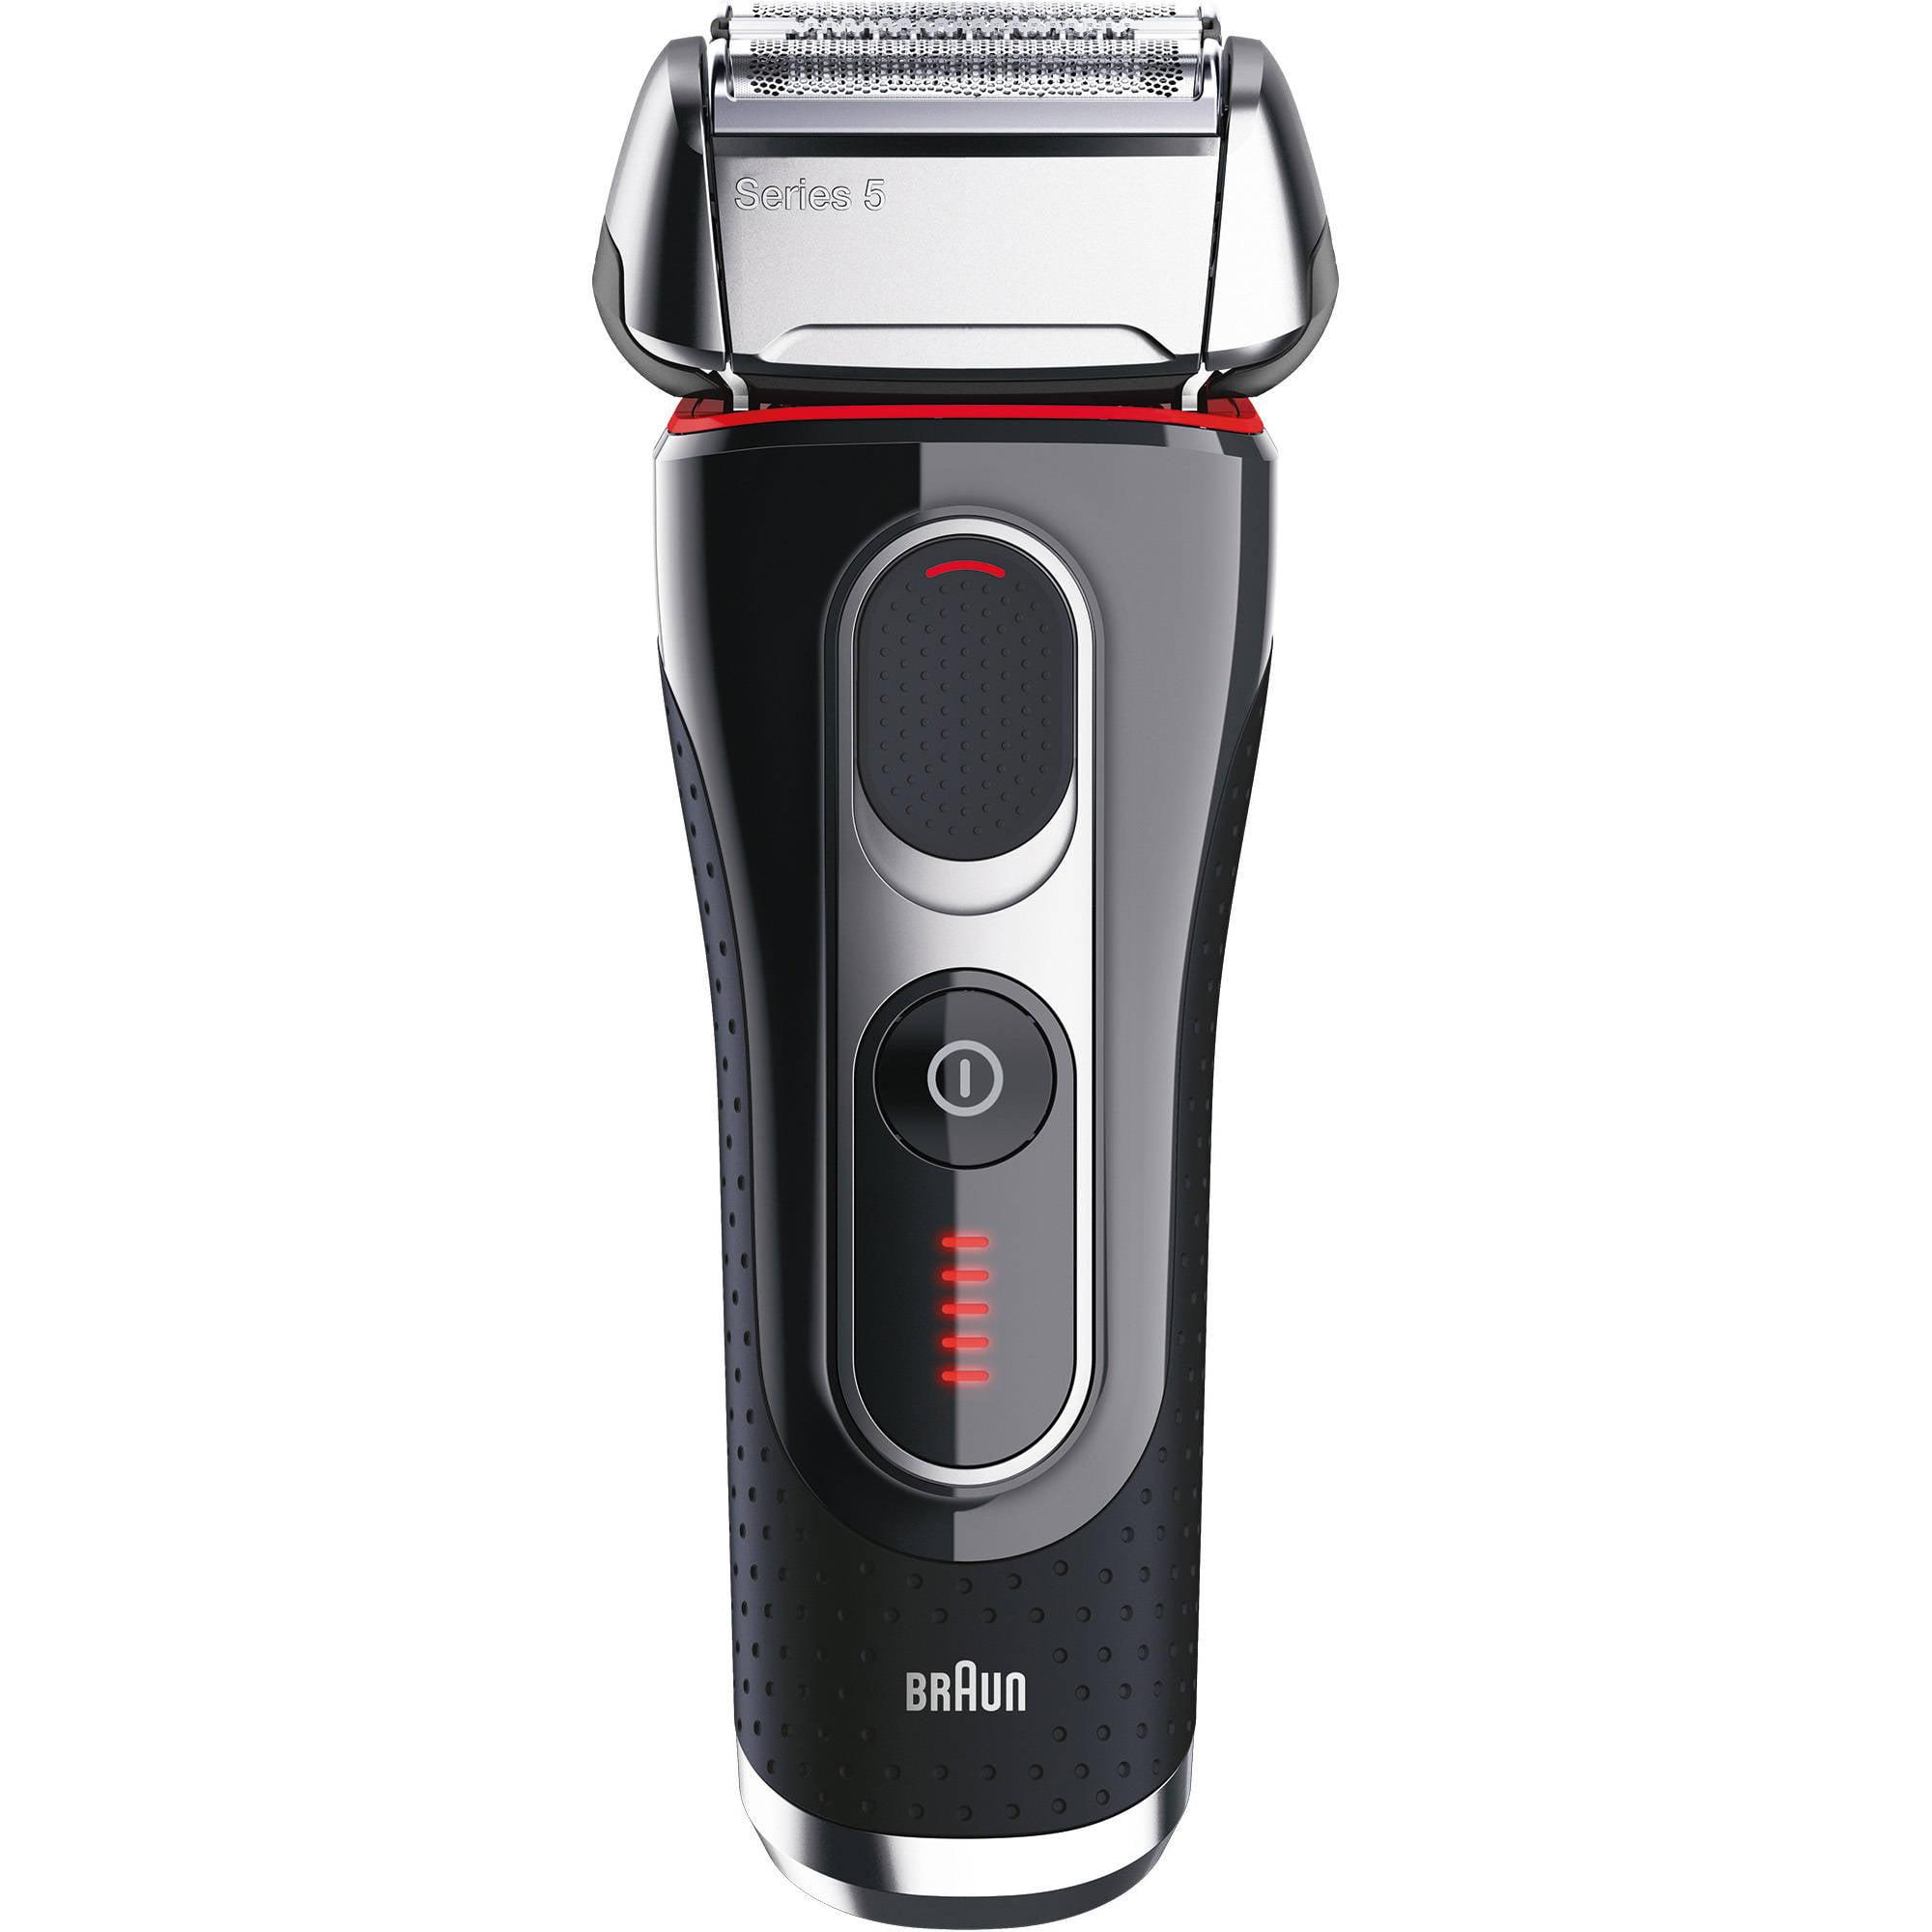 Braun Series 5 5090cc Electric Shaver With Cleaning Center Plus Bonus Mobile